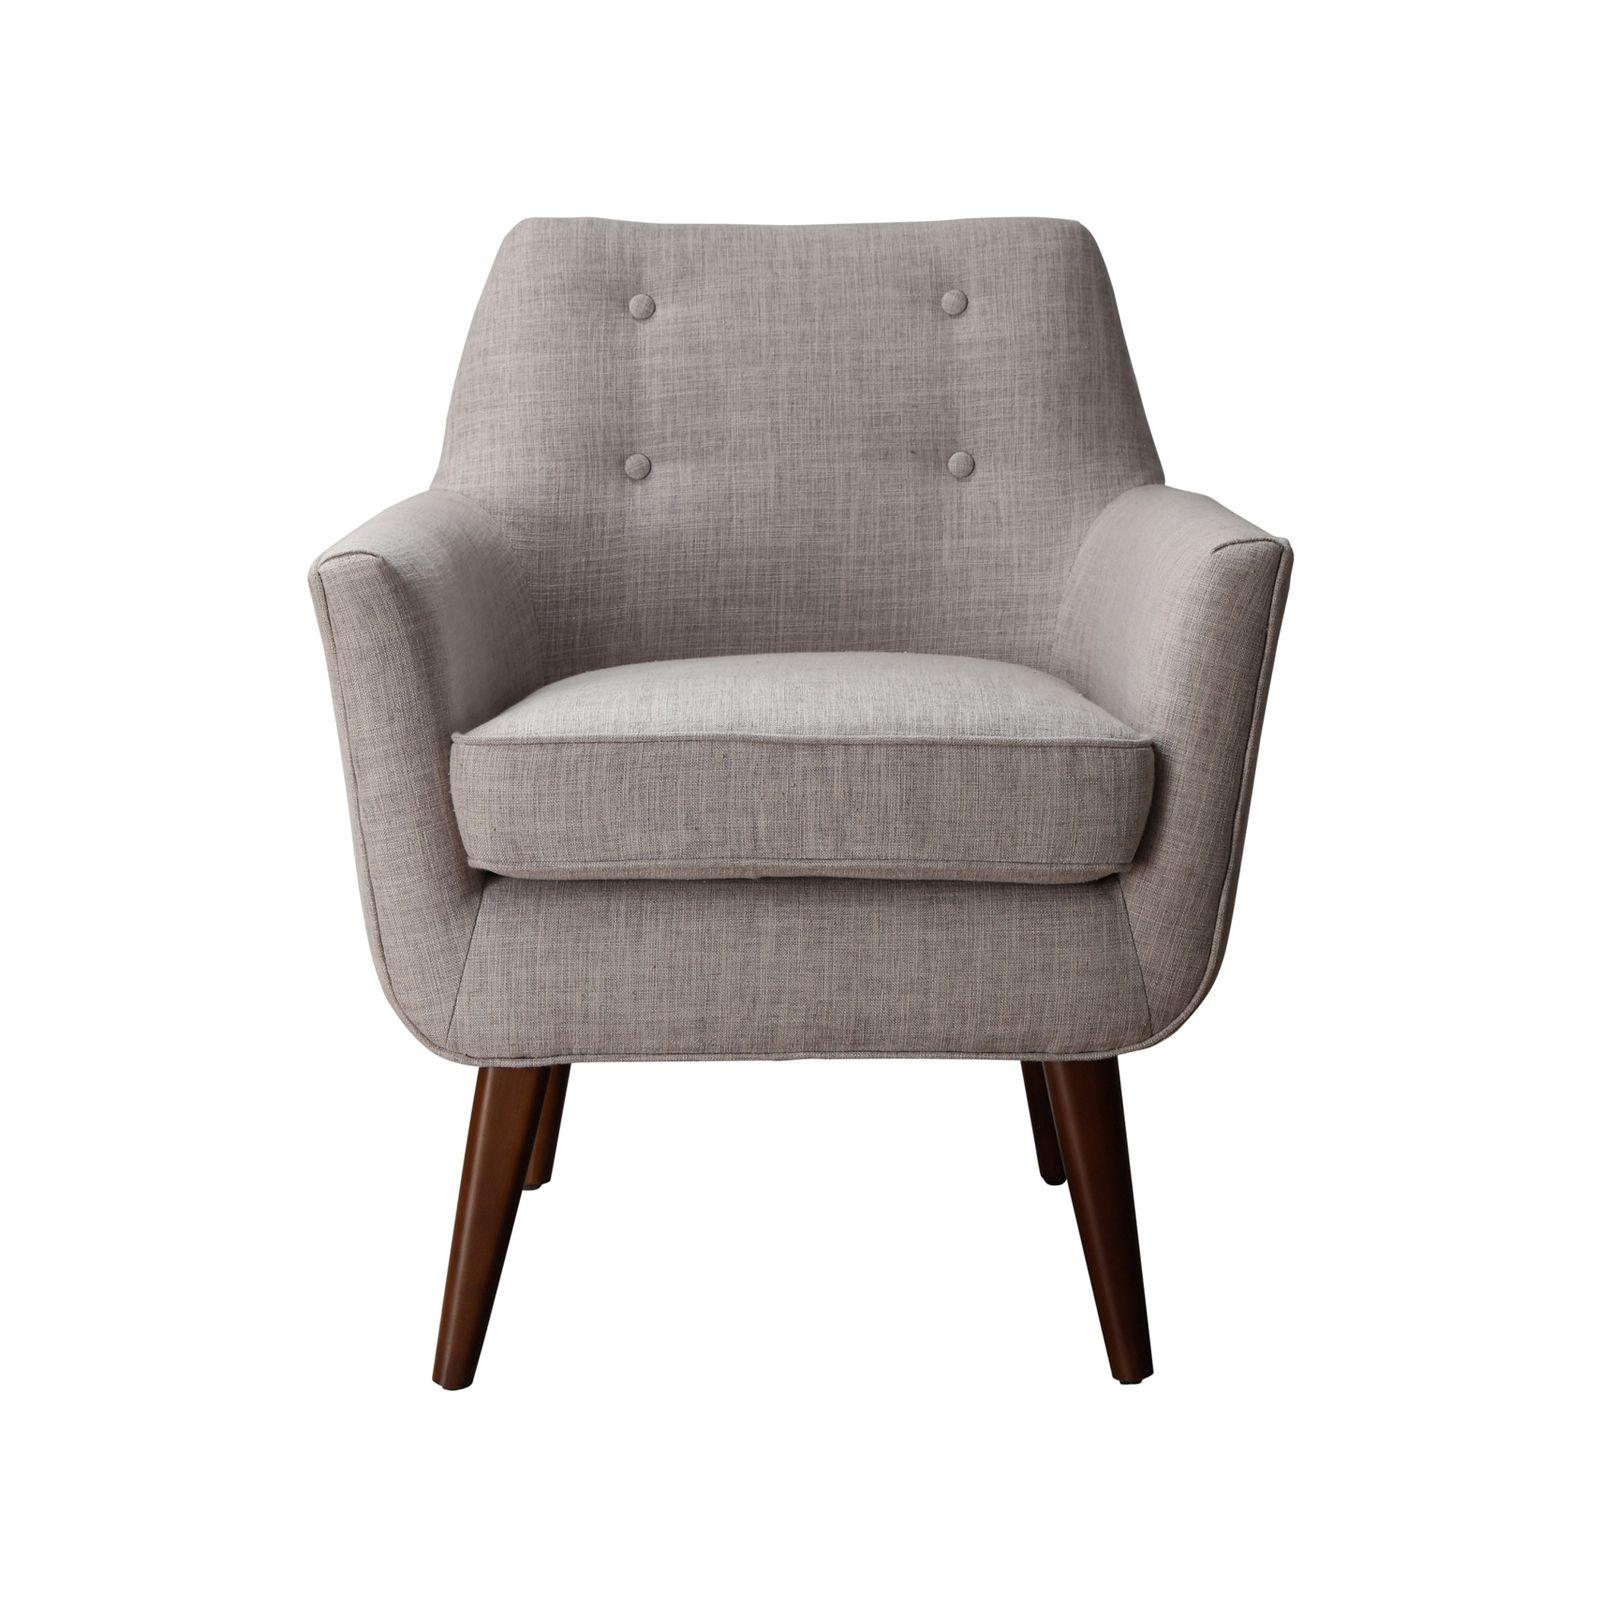 Dot u0026 Bo u2013 Furniture and Dcor